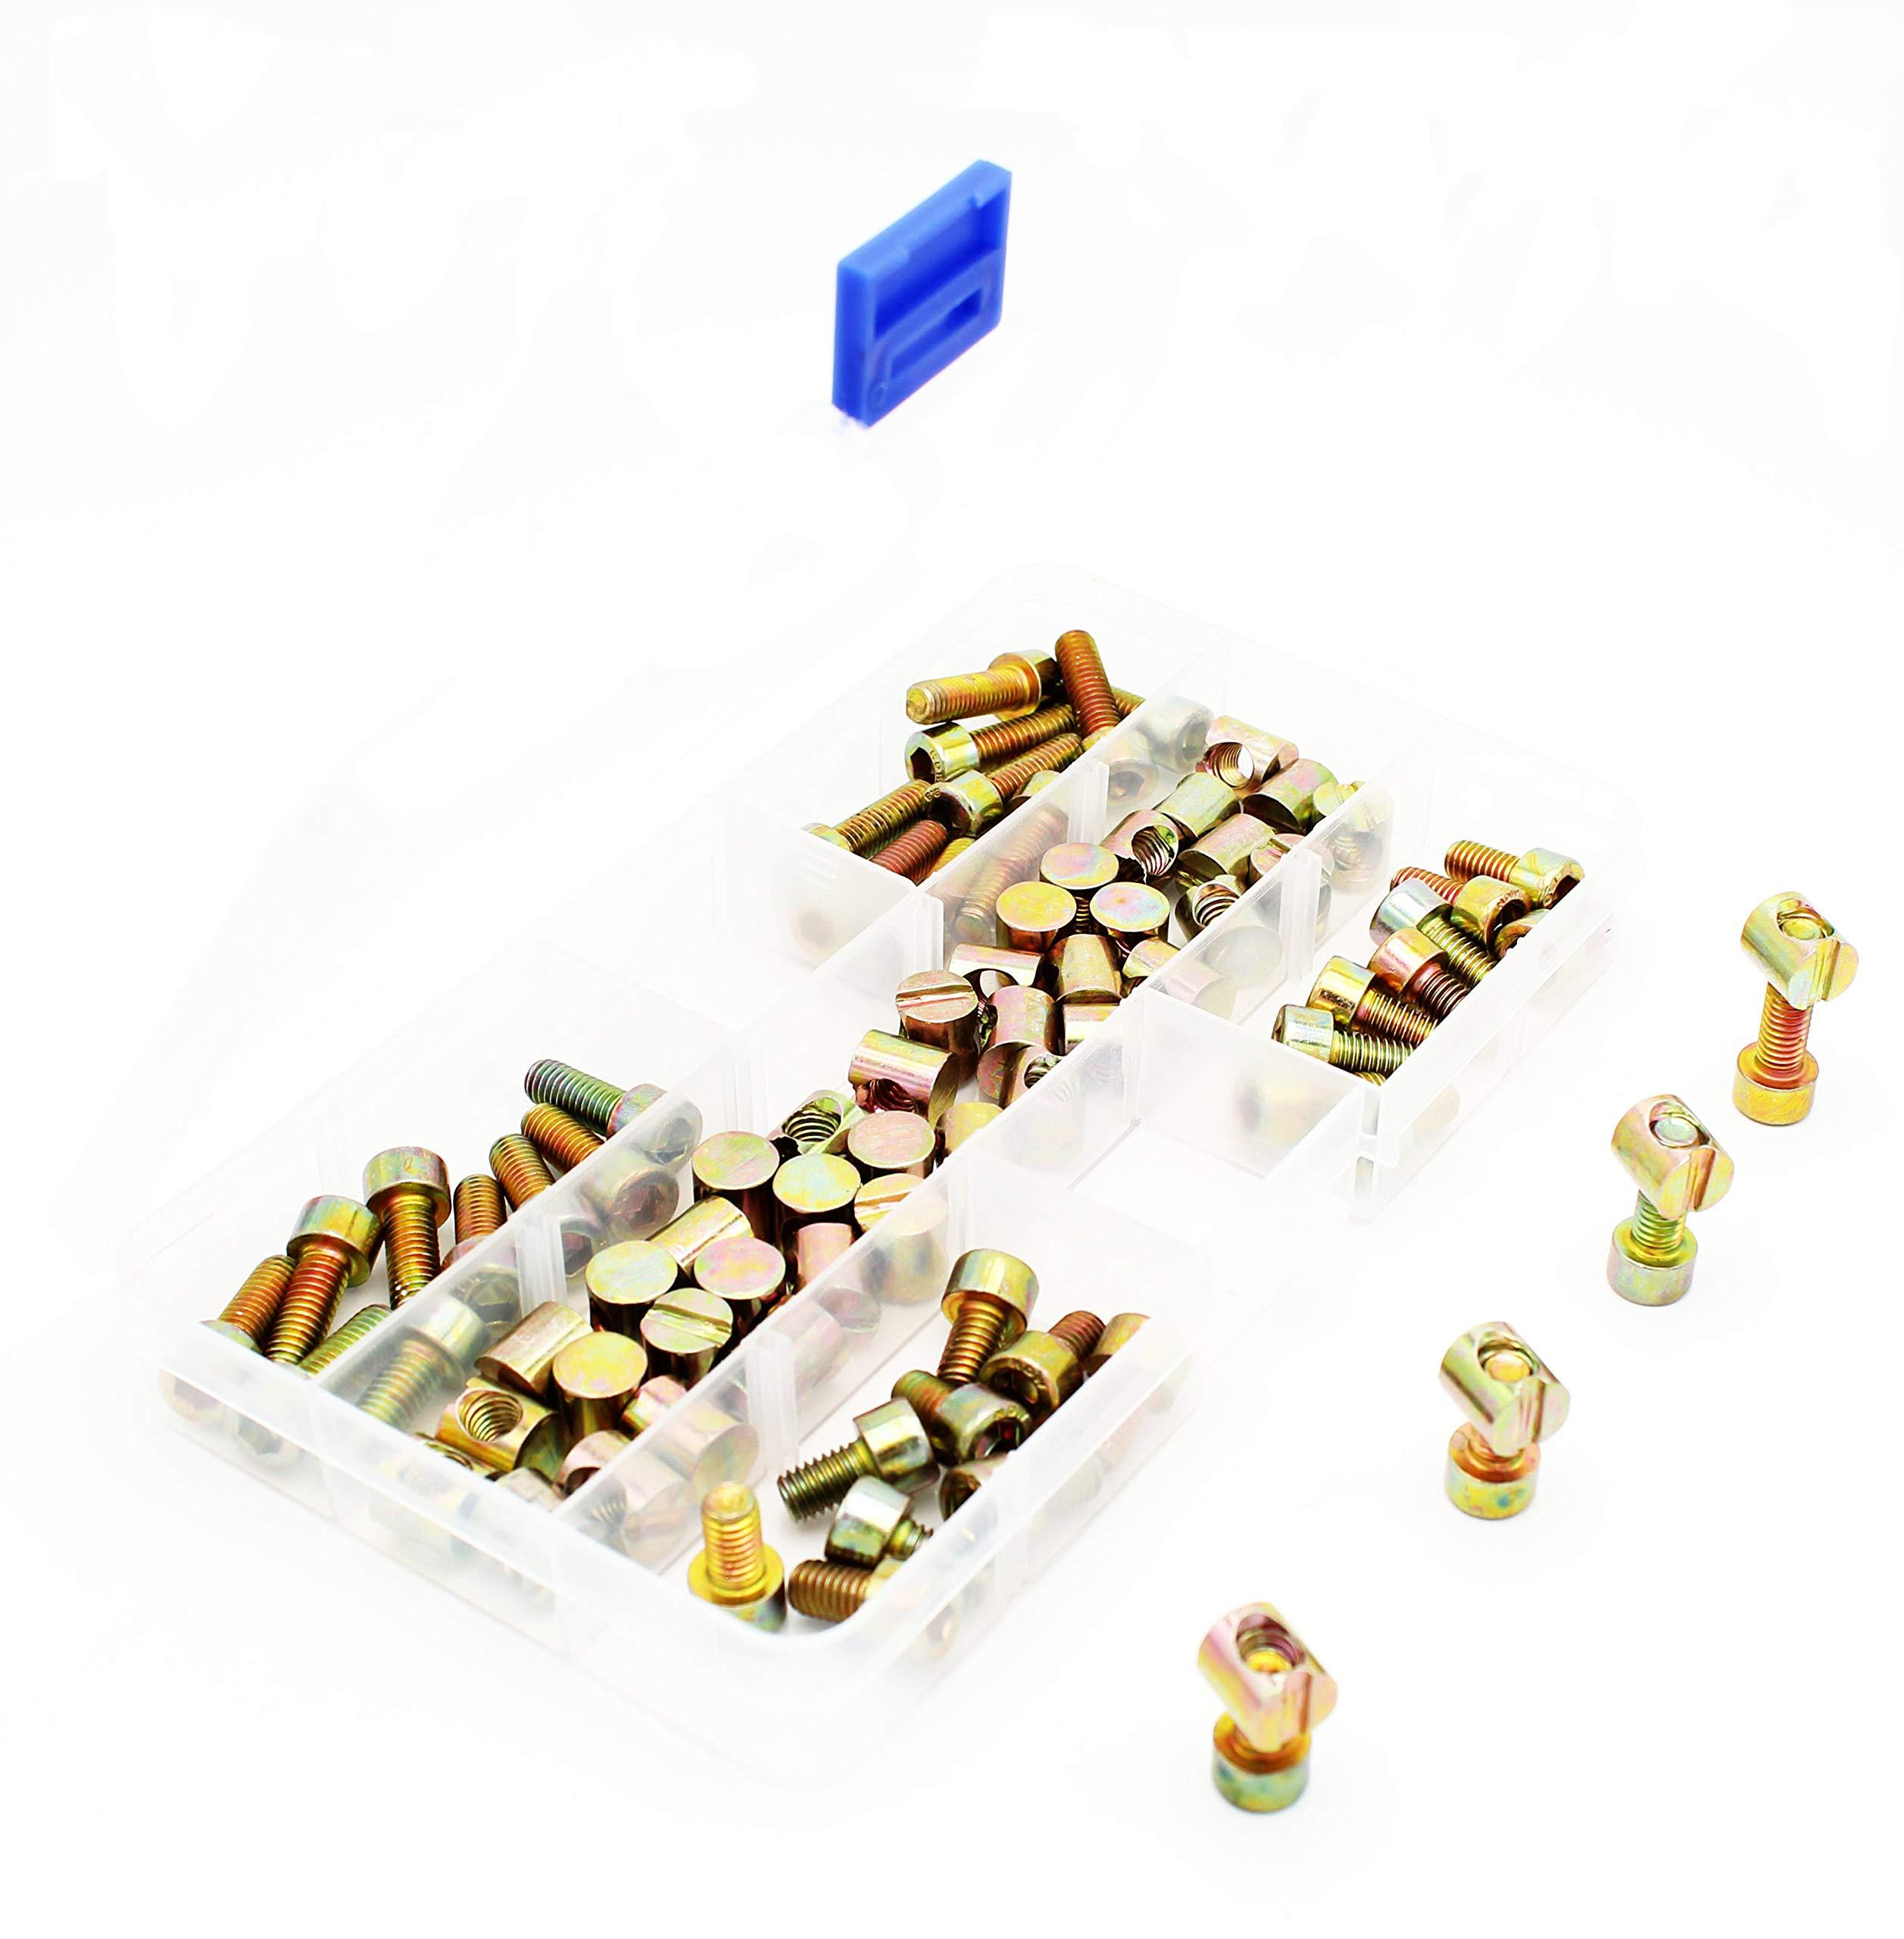 Smartsails (100Pcs) M6 Furniture Bucket Nut Bolt Classification Kit, Crib Hardware Parts,Hexagonal Sleeve M6 x10mm / 12mm /16mm / 20mm Crib Bolt Sleeve Nut 50 Sets by Smartsails